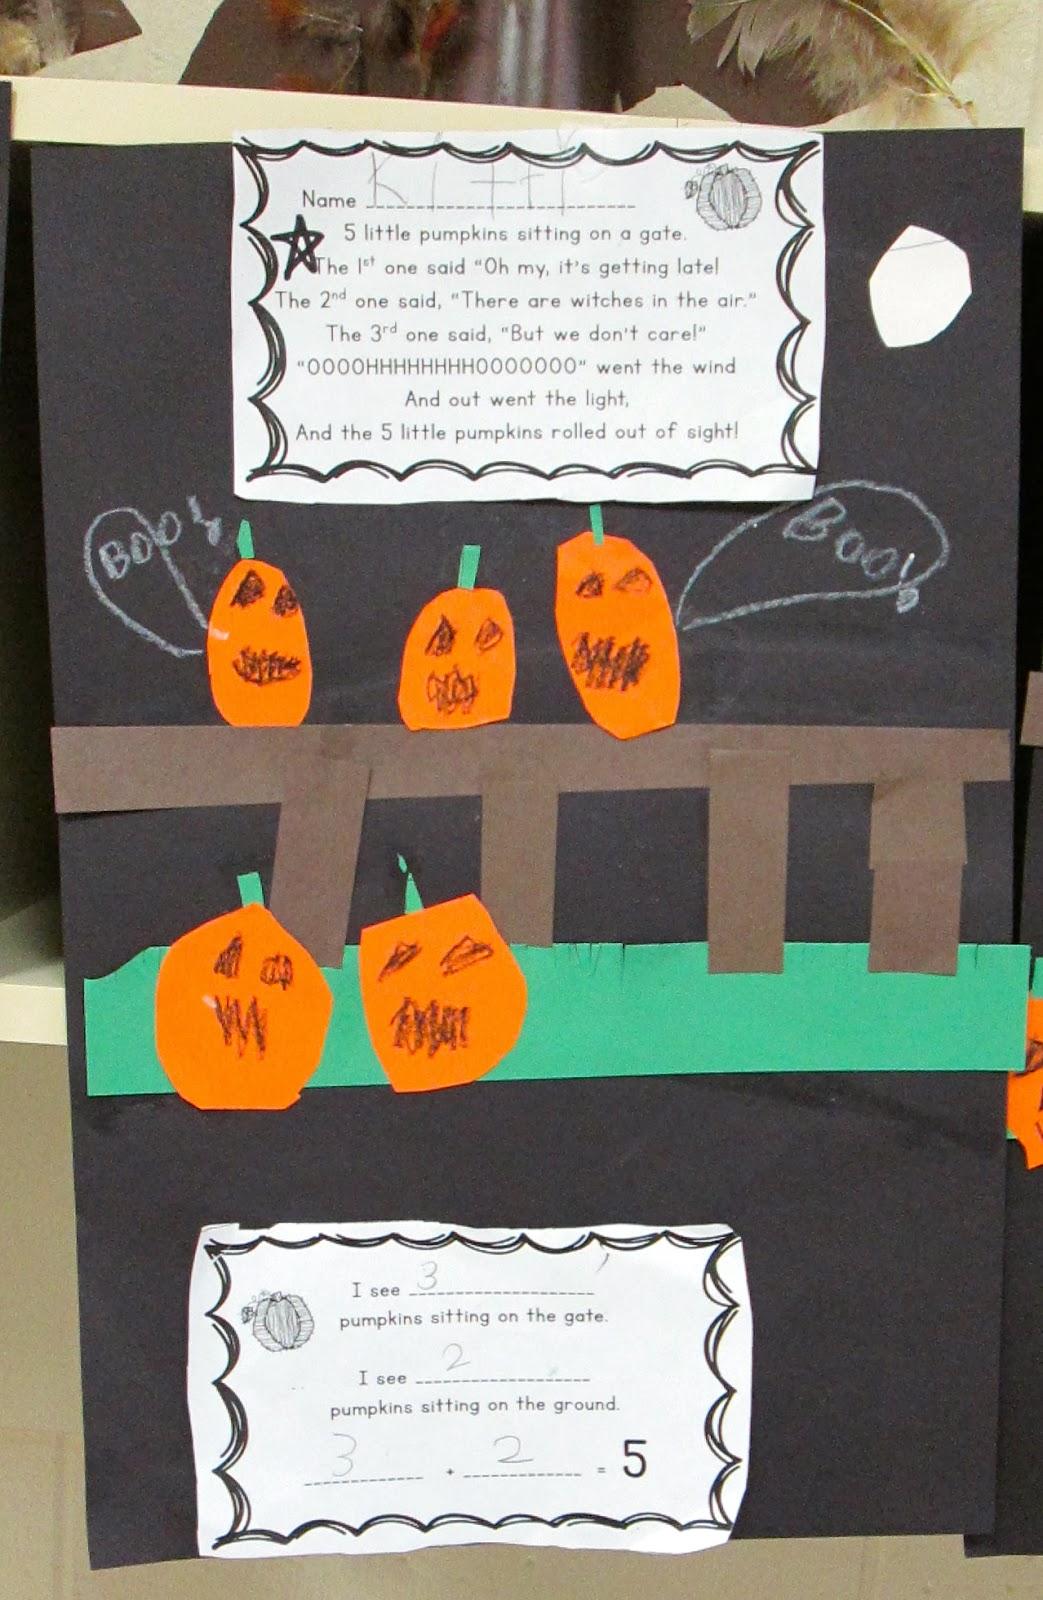 Five Little Pumpkins Sitting On A Gate Math Craft For